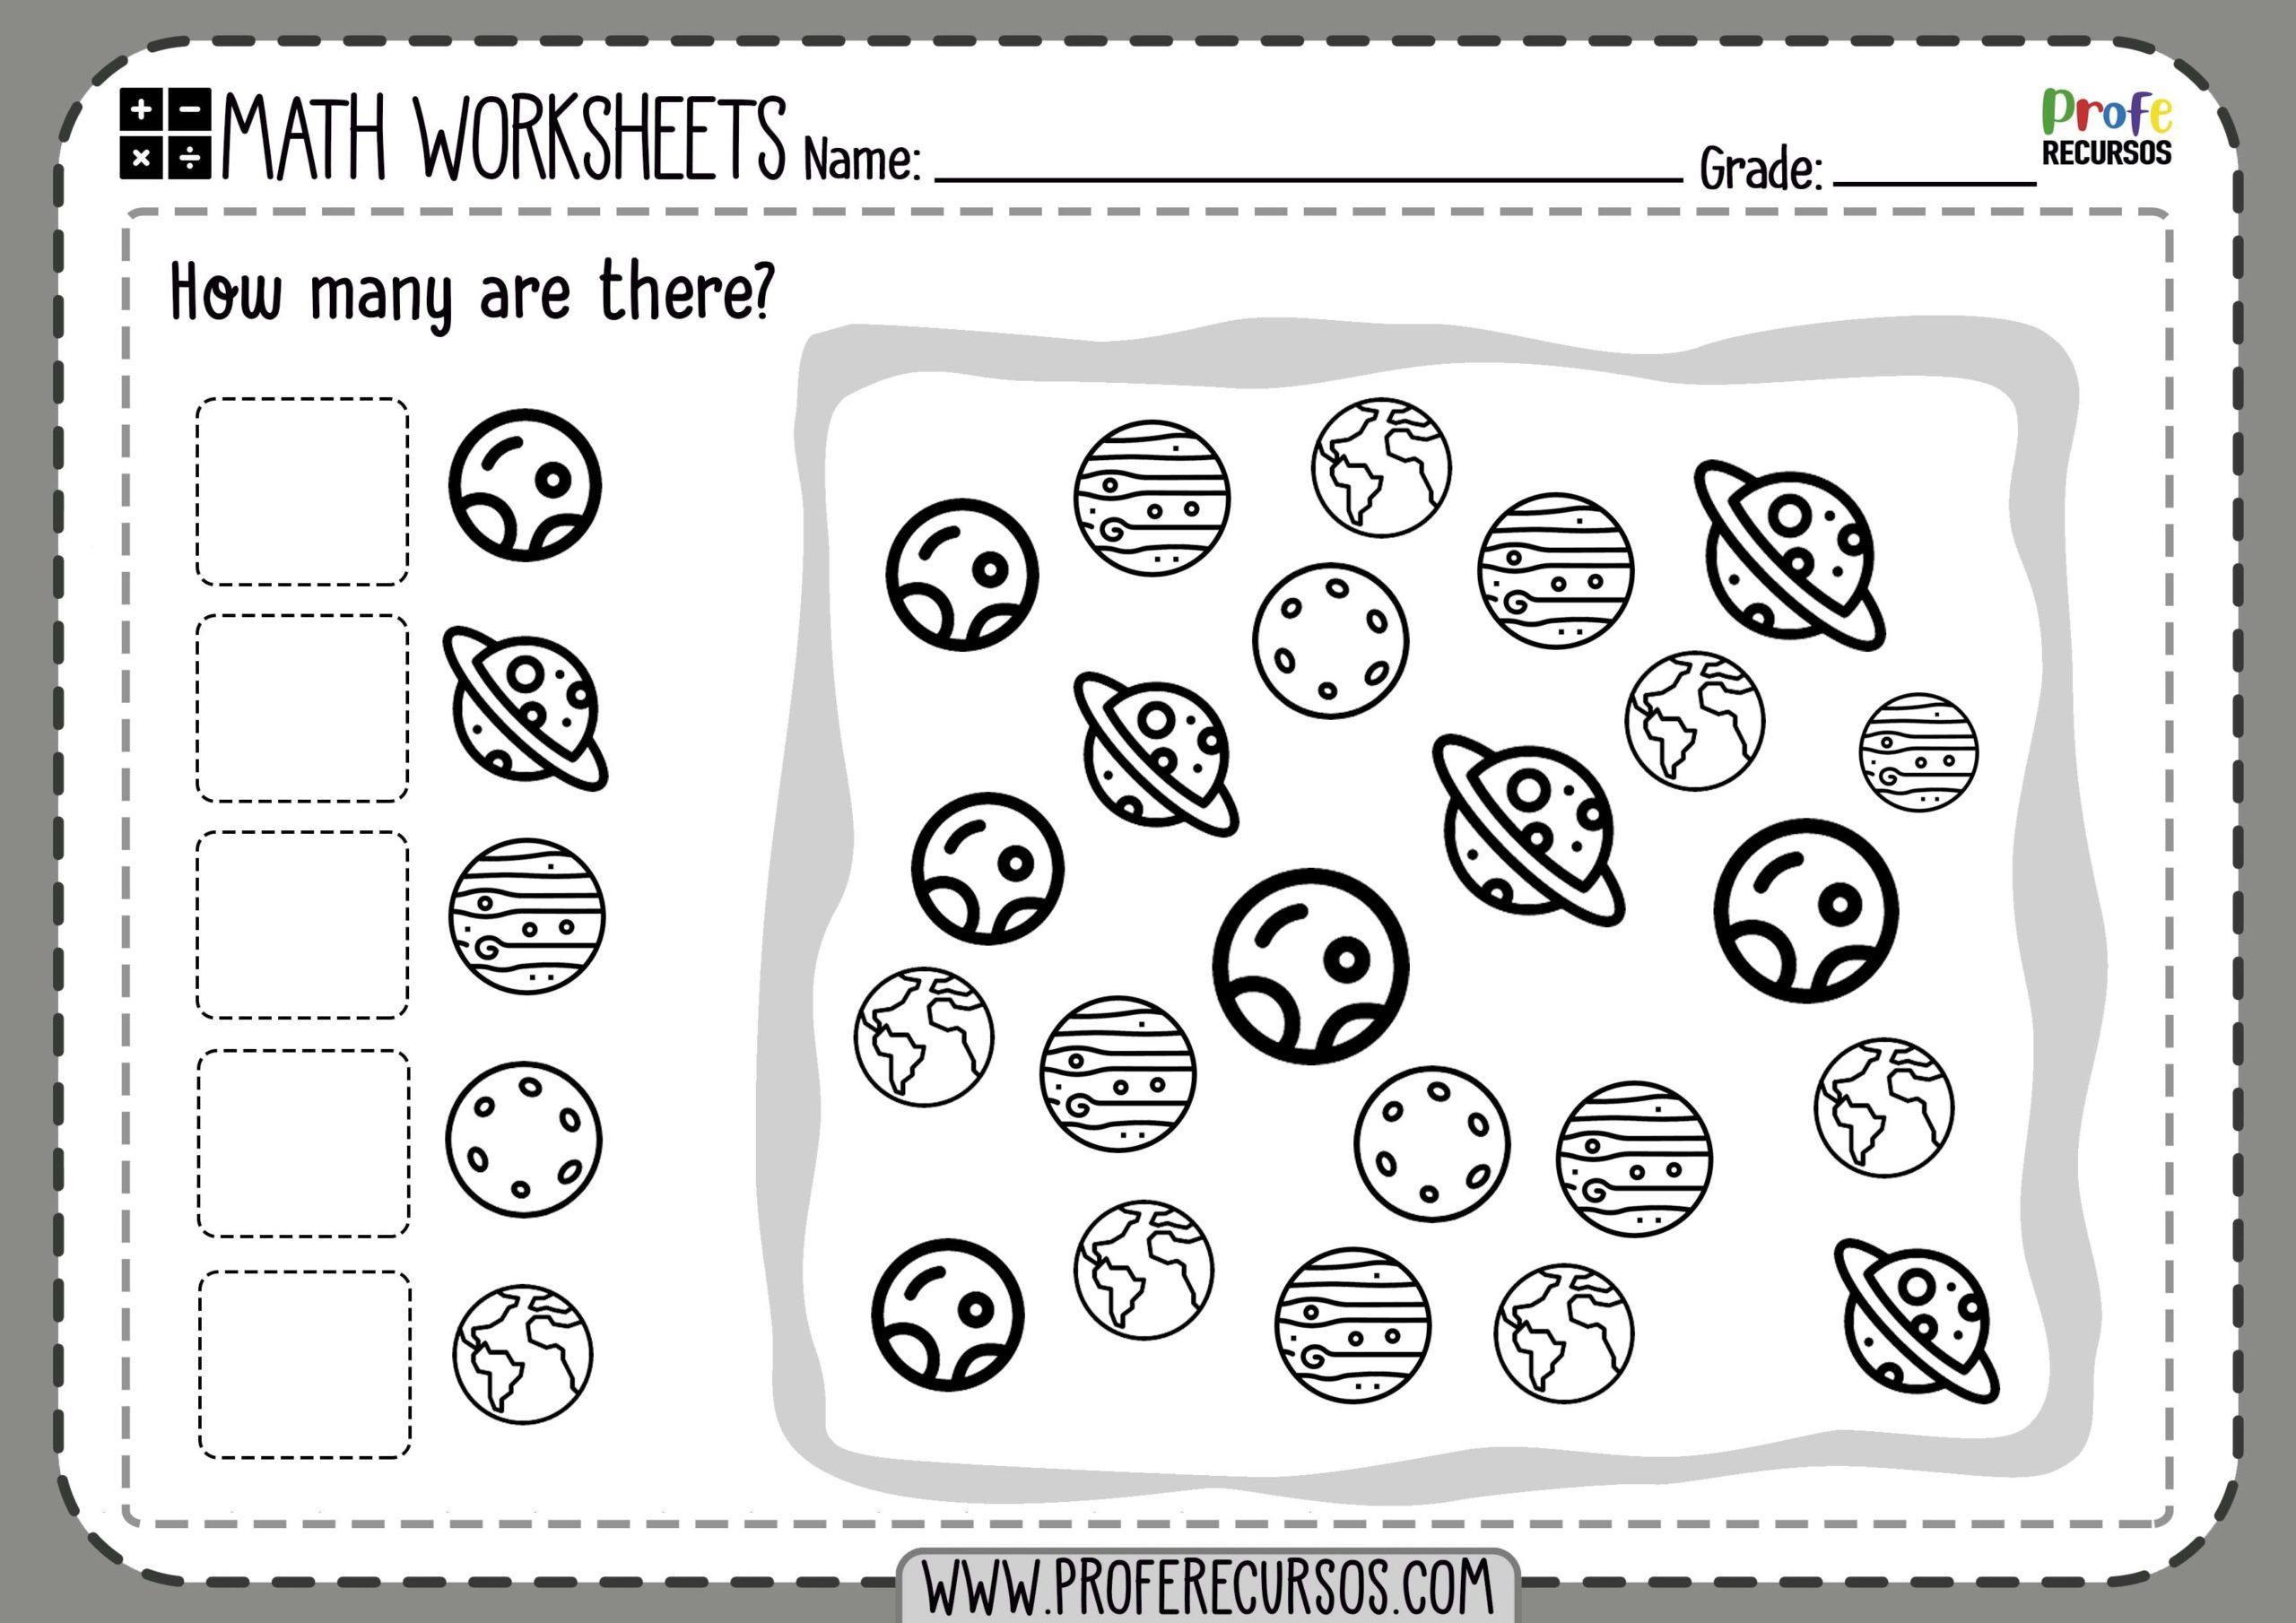 Math Worksheets To Print 6th Grade